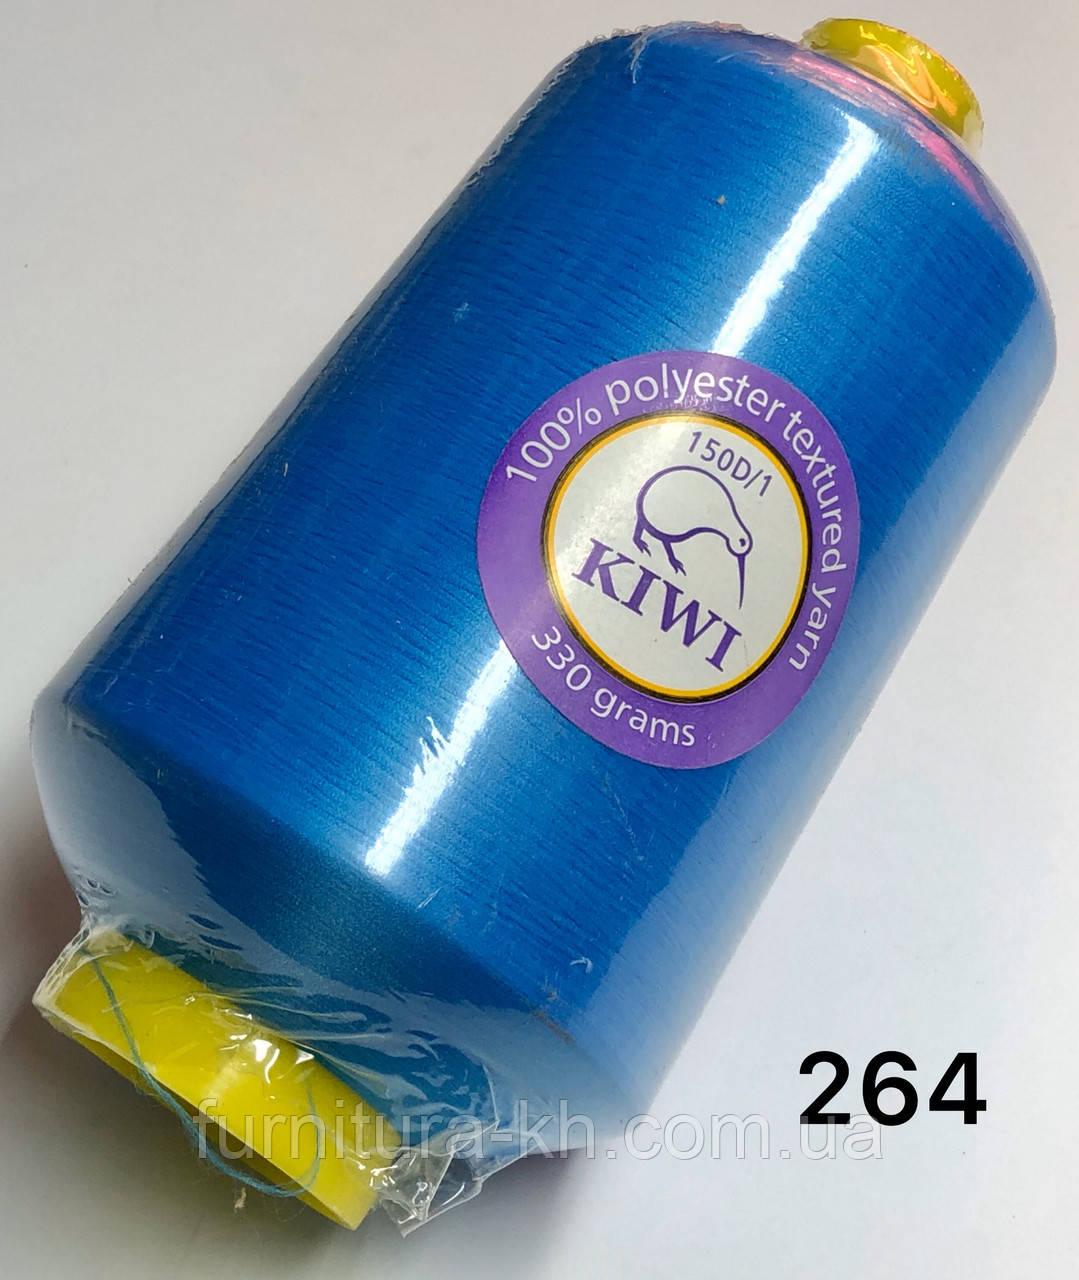 Нитки для Оверлока (Текстурированные).Для трикотажа.Цвет 264.Намотка 20.000 метров Вес 330 грамм